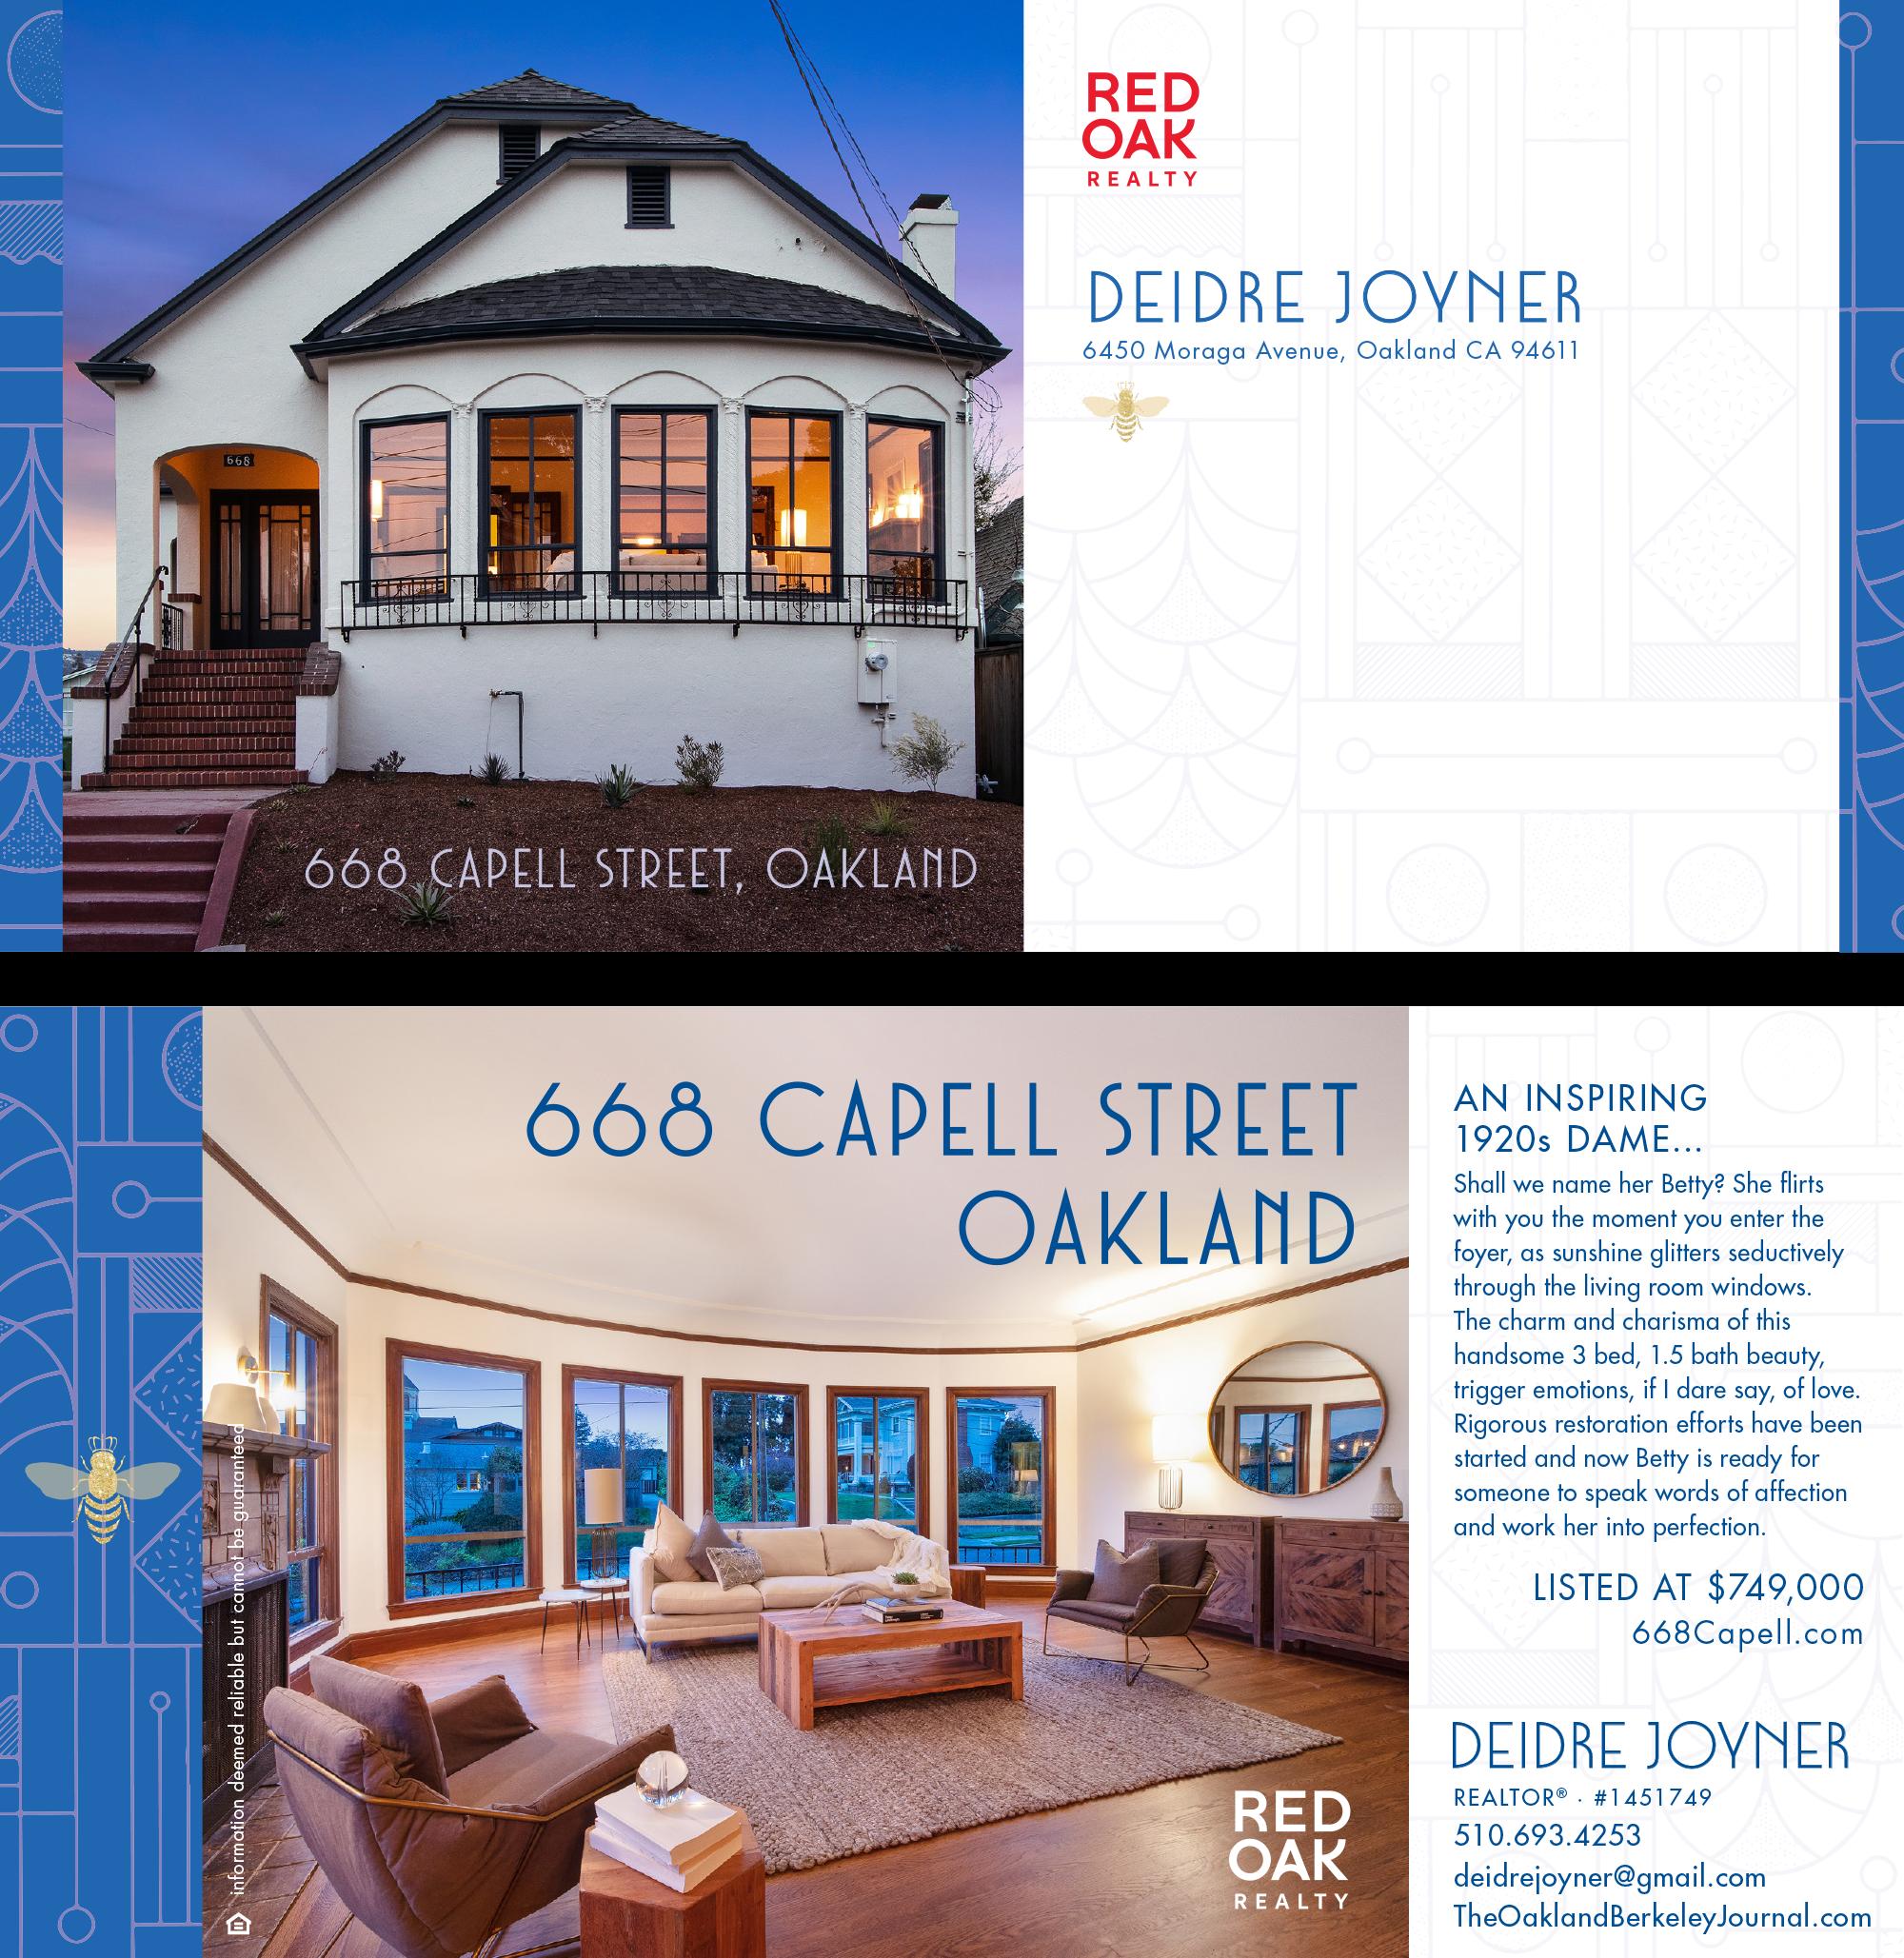 668 Capell Street, Oakland